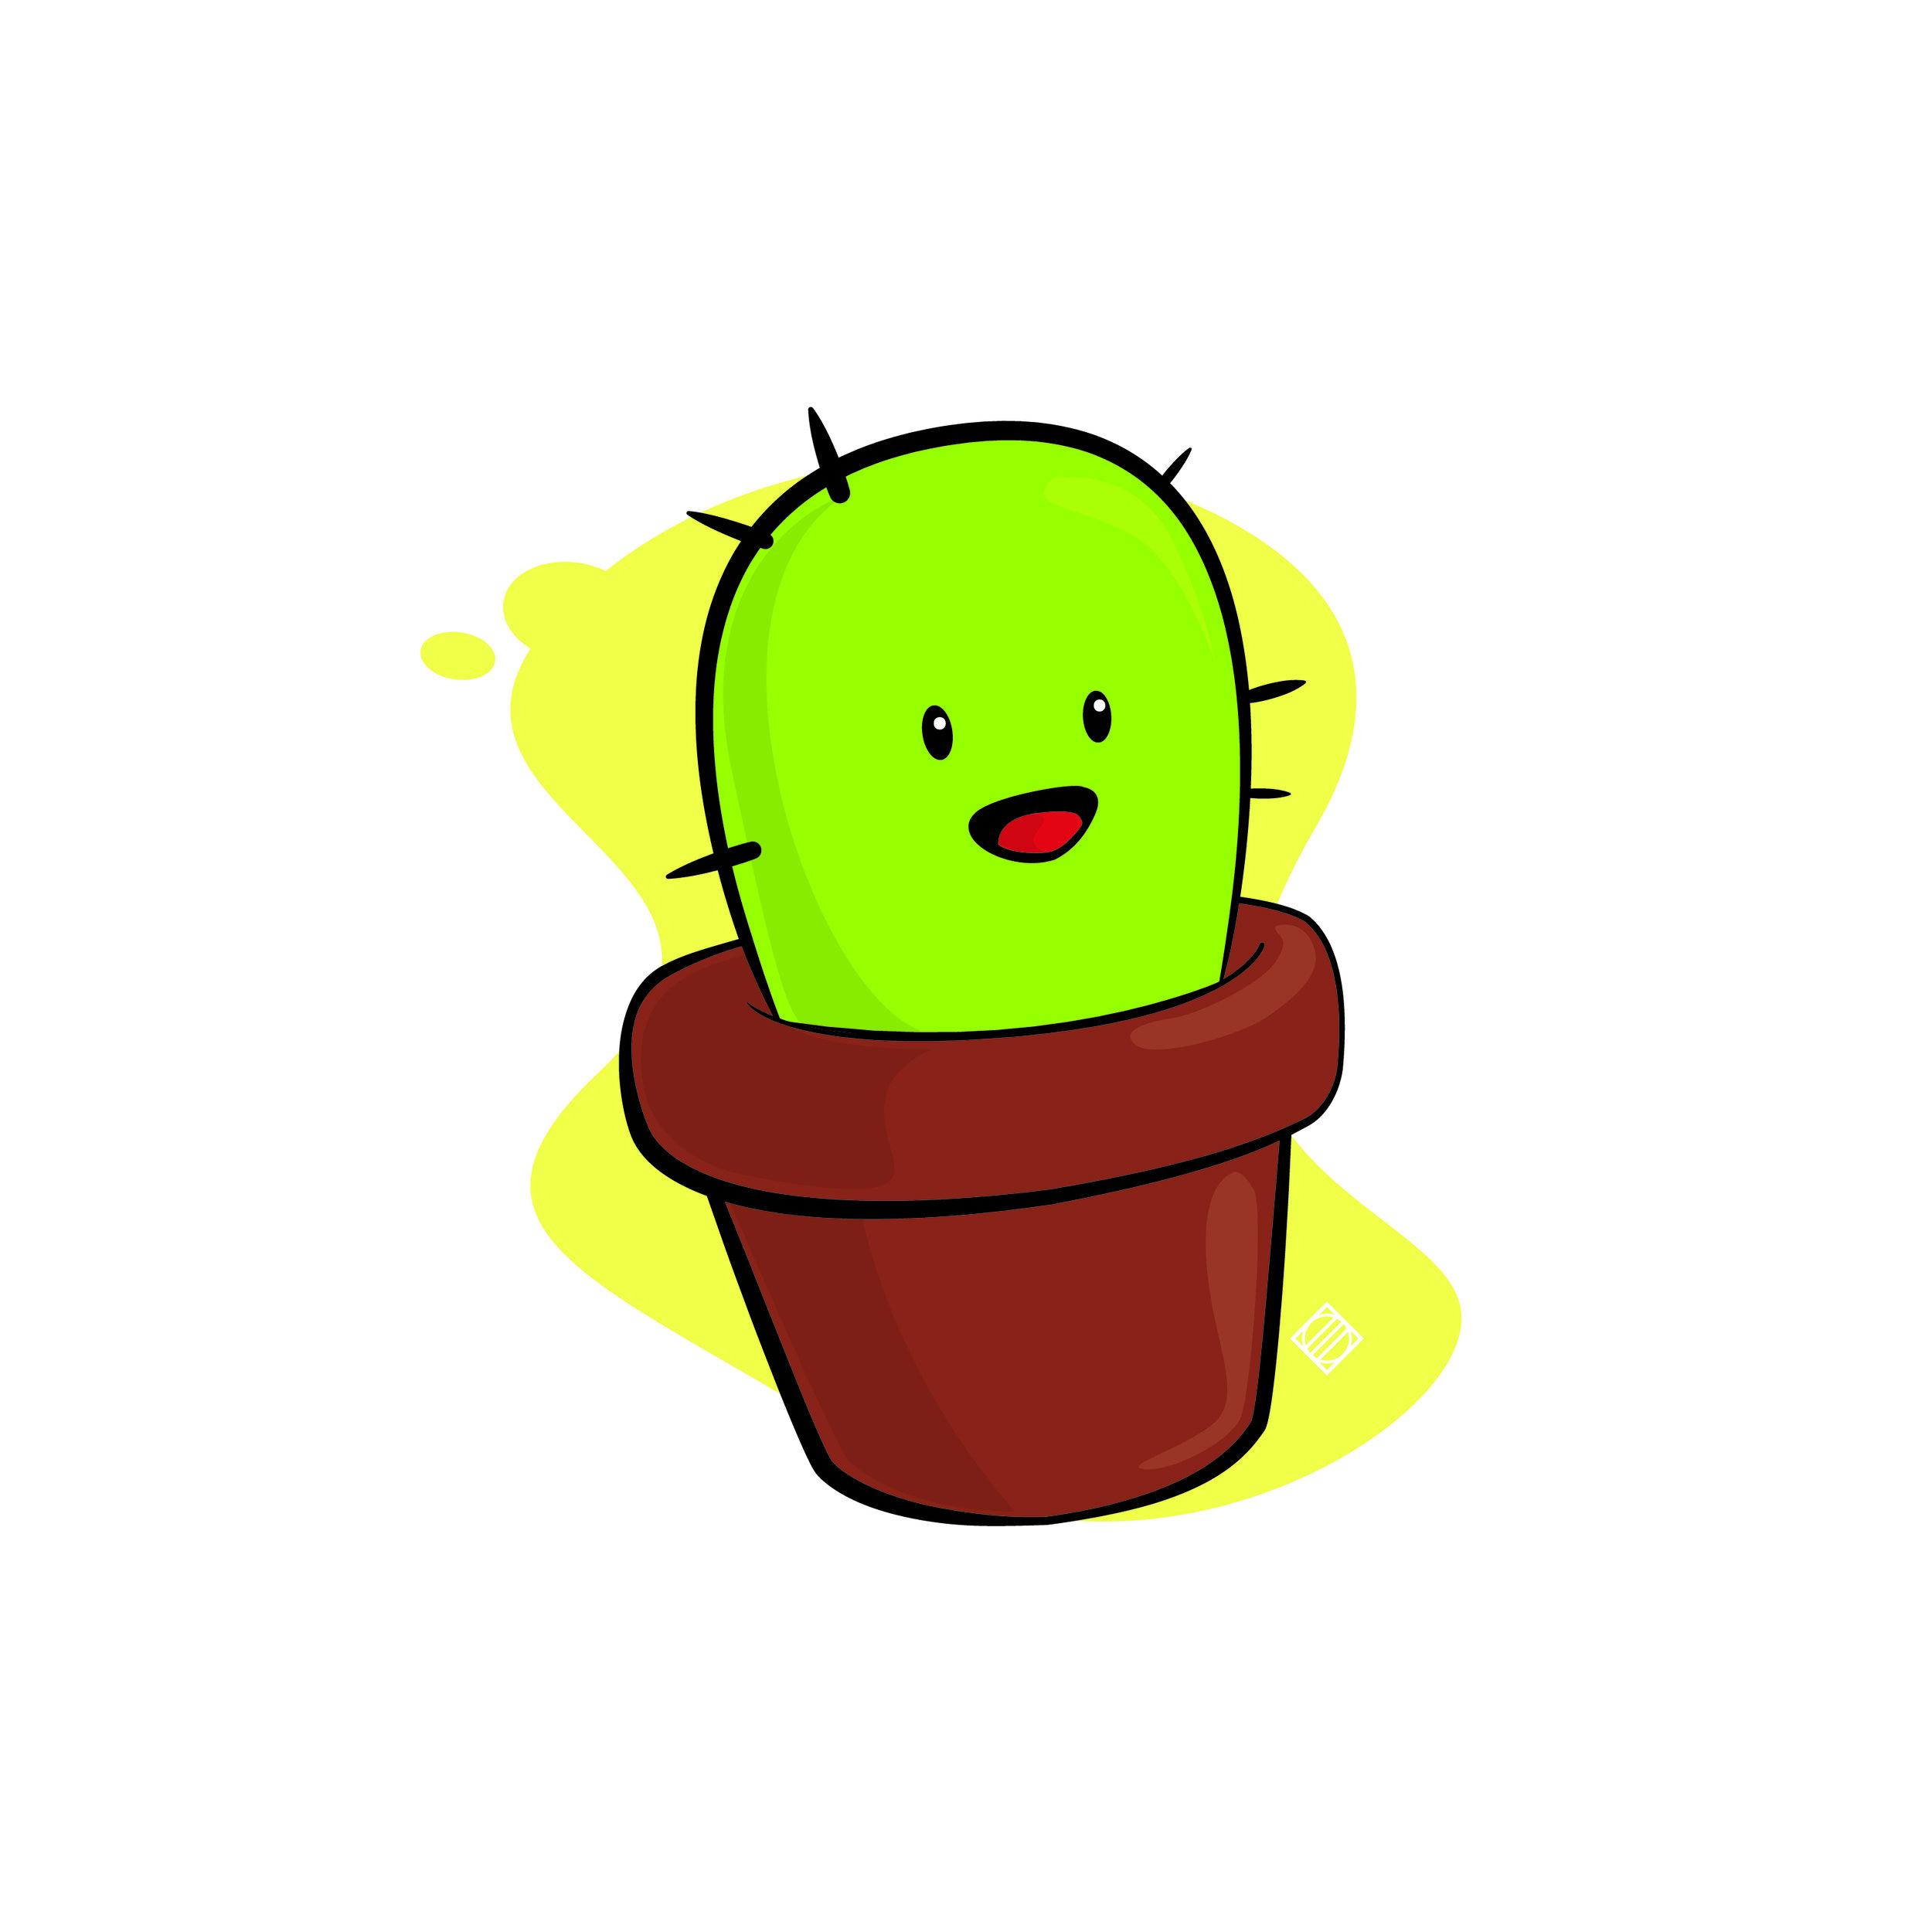 JN Baby Cactus - Digital Artwork by Mark Penacerrada